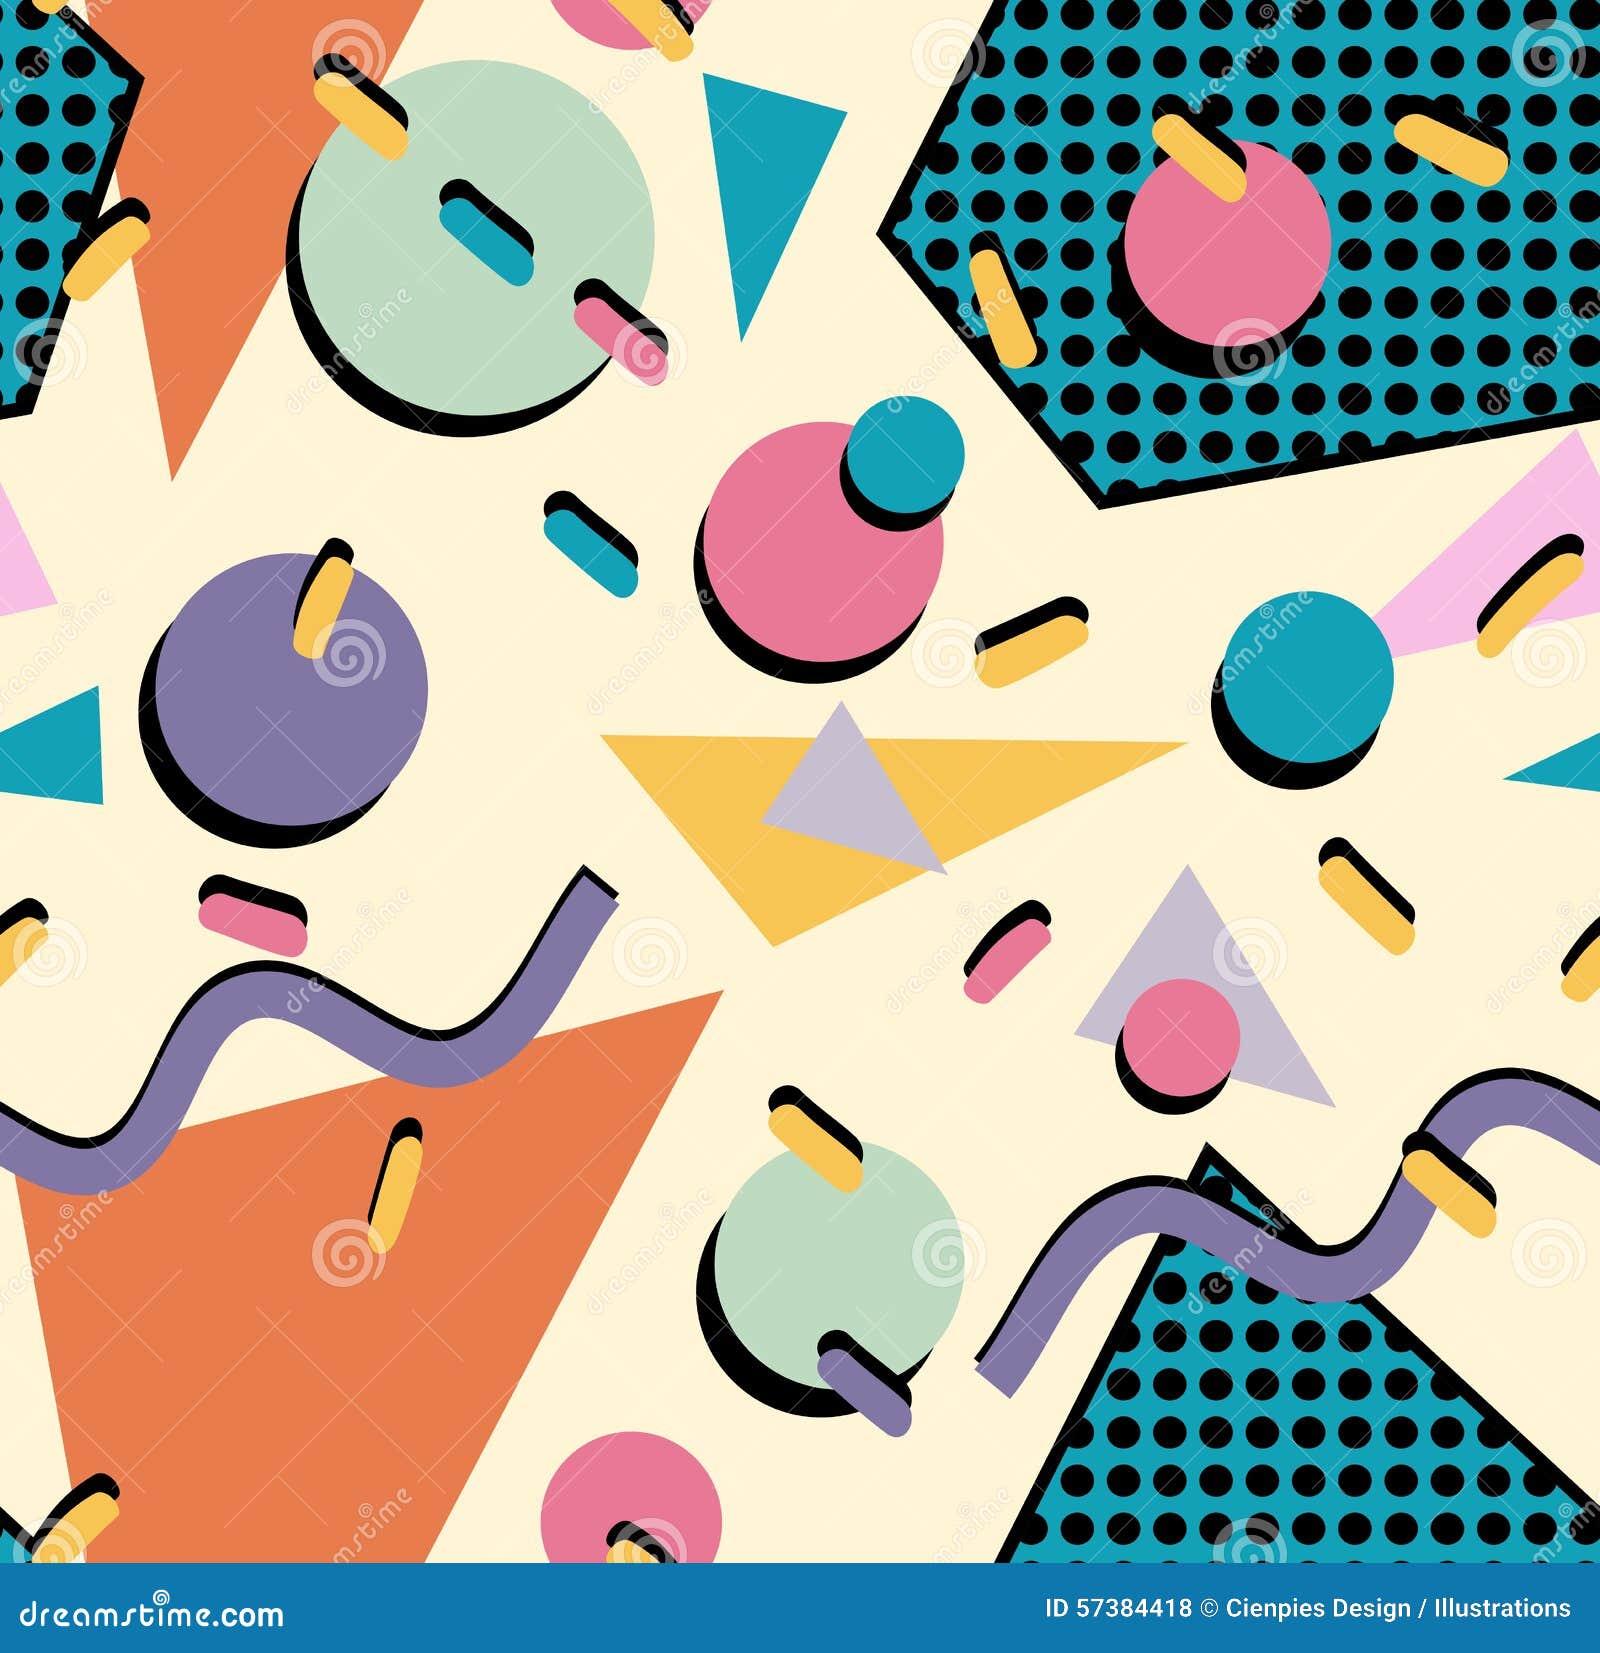 80s Pattern Interesting Design Ideas